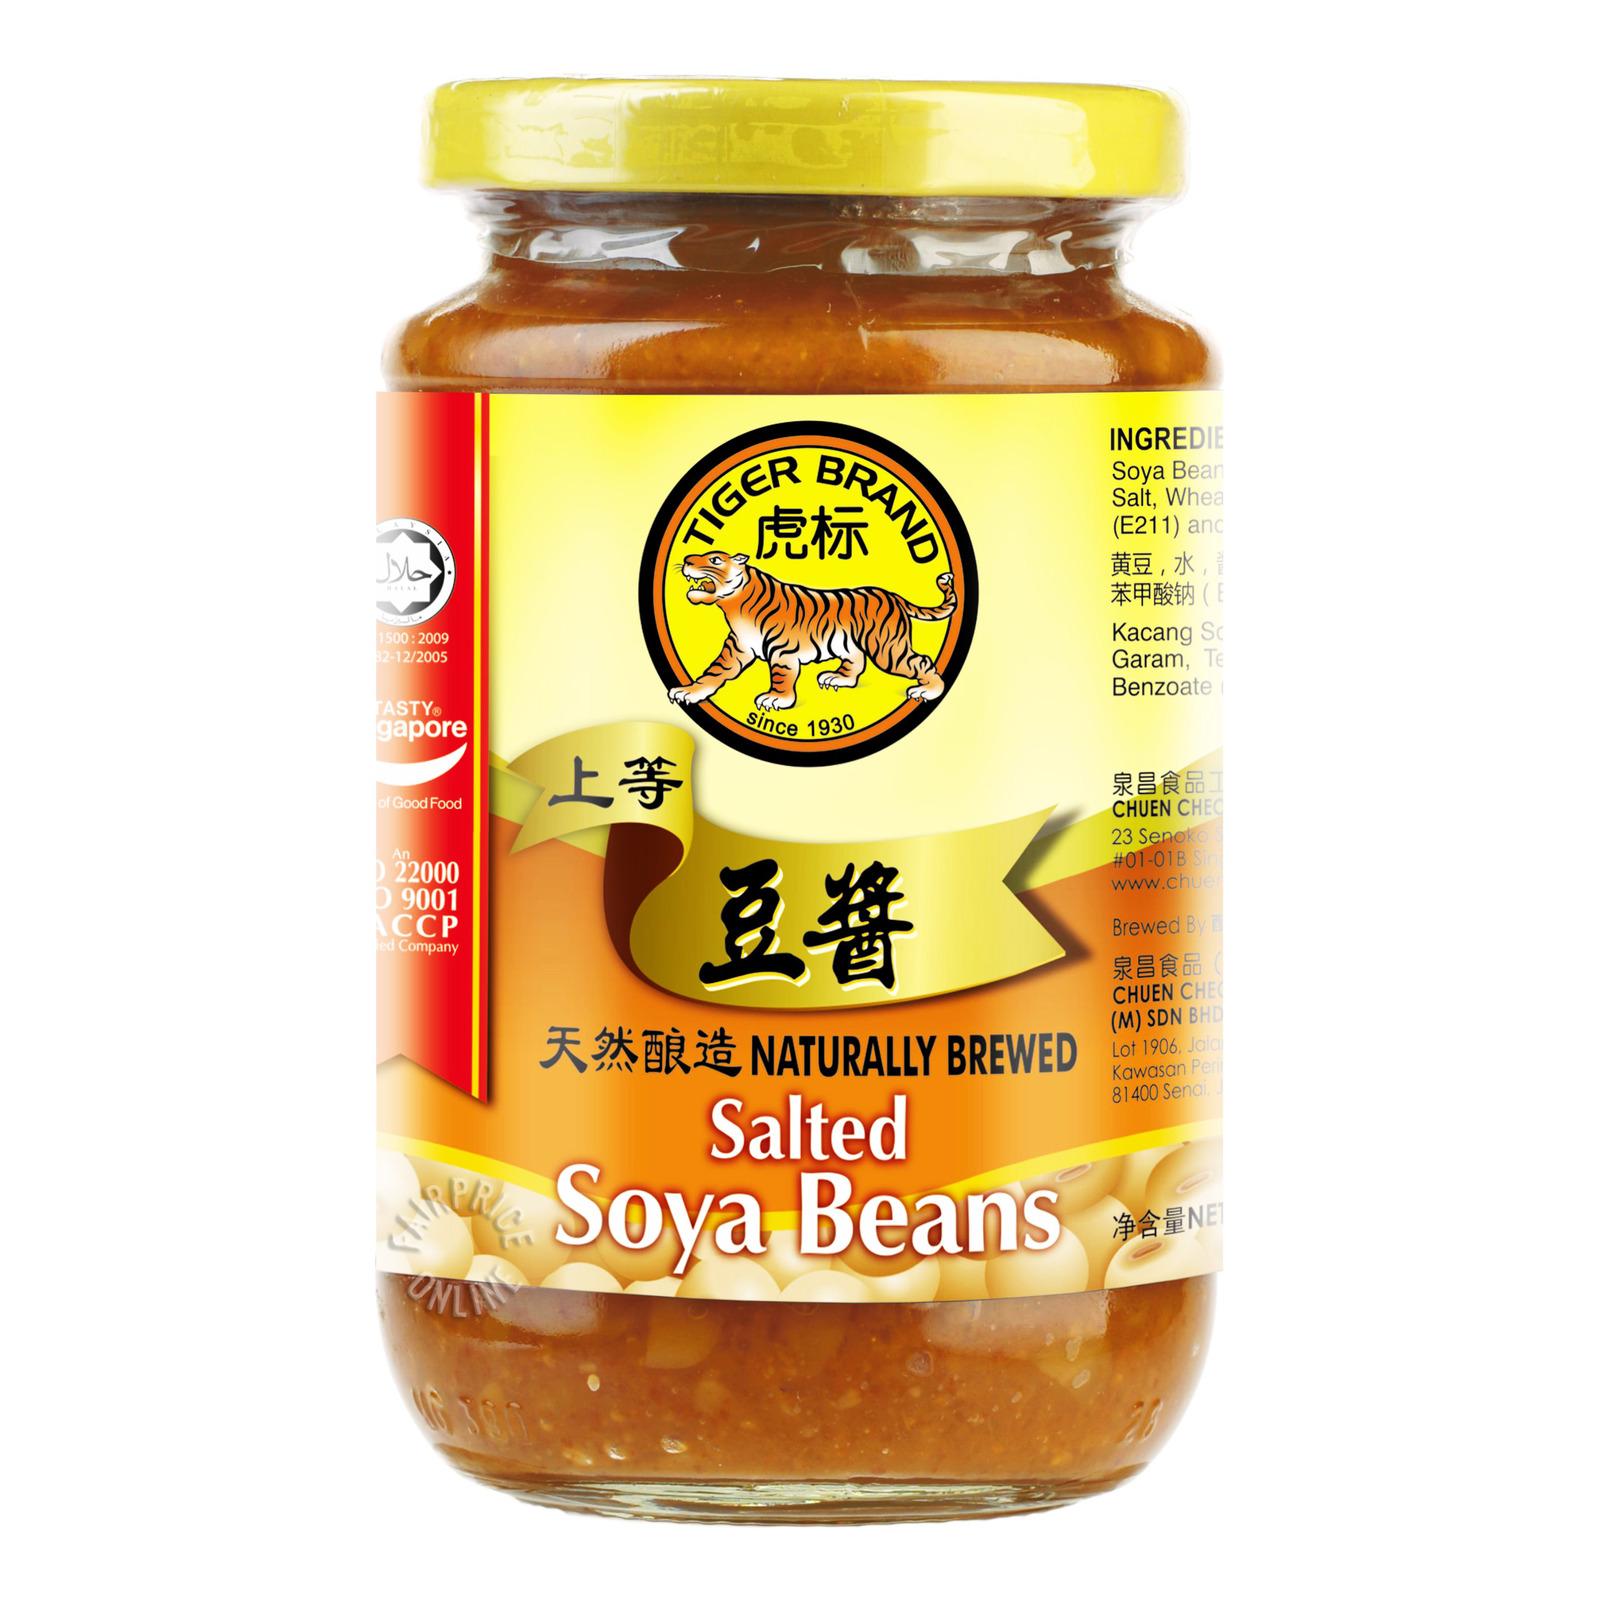 Tiger Brand Salted Soya Beans